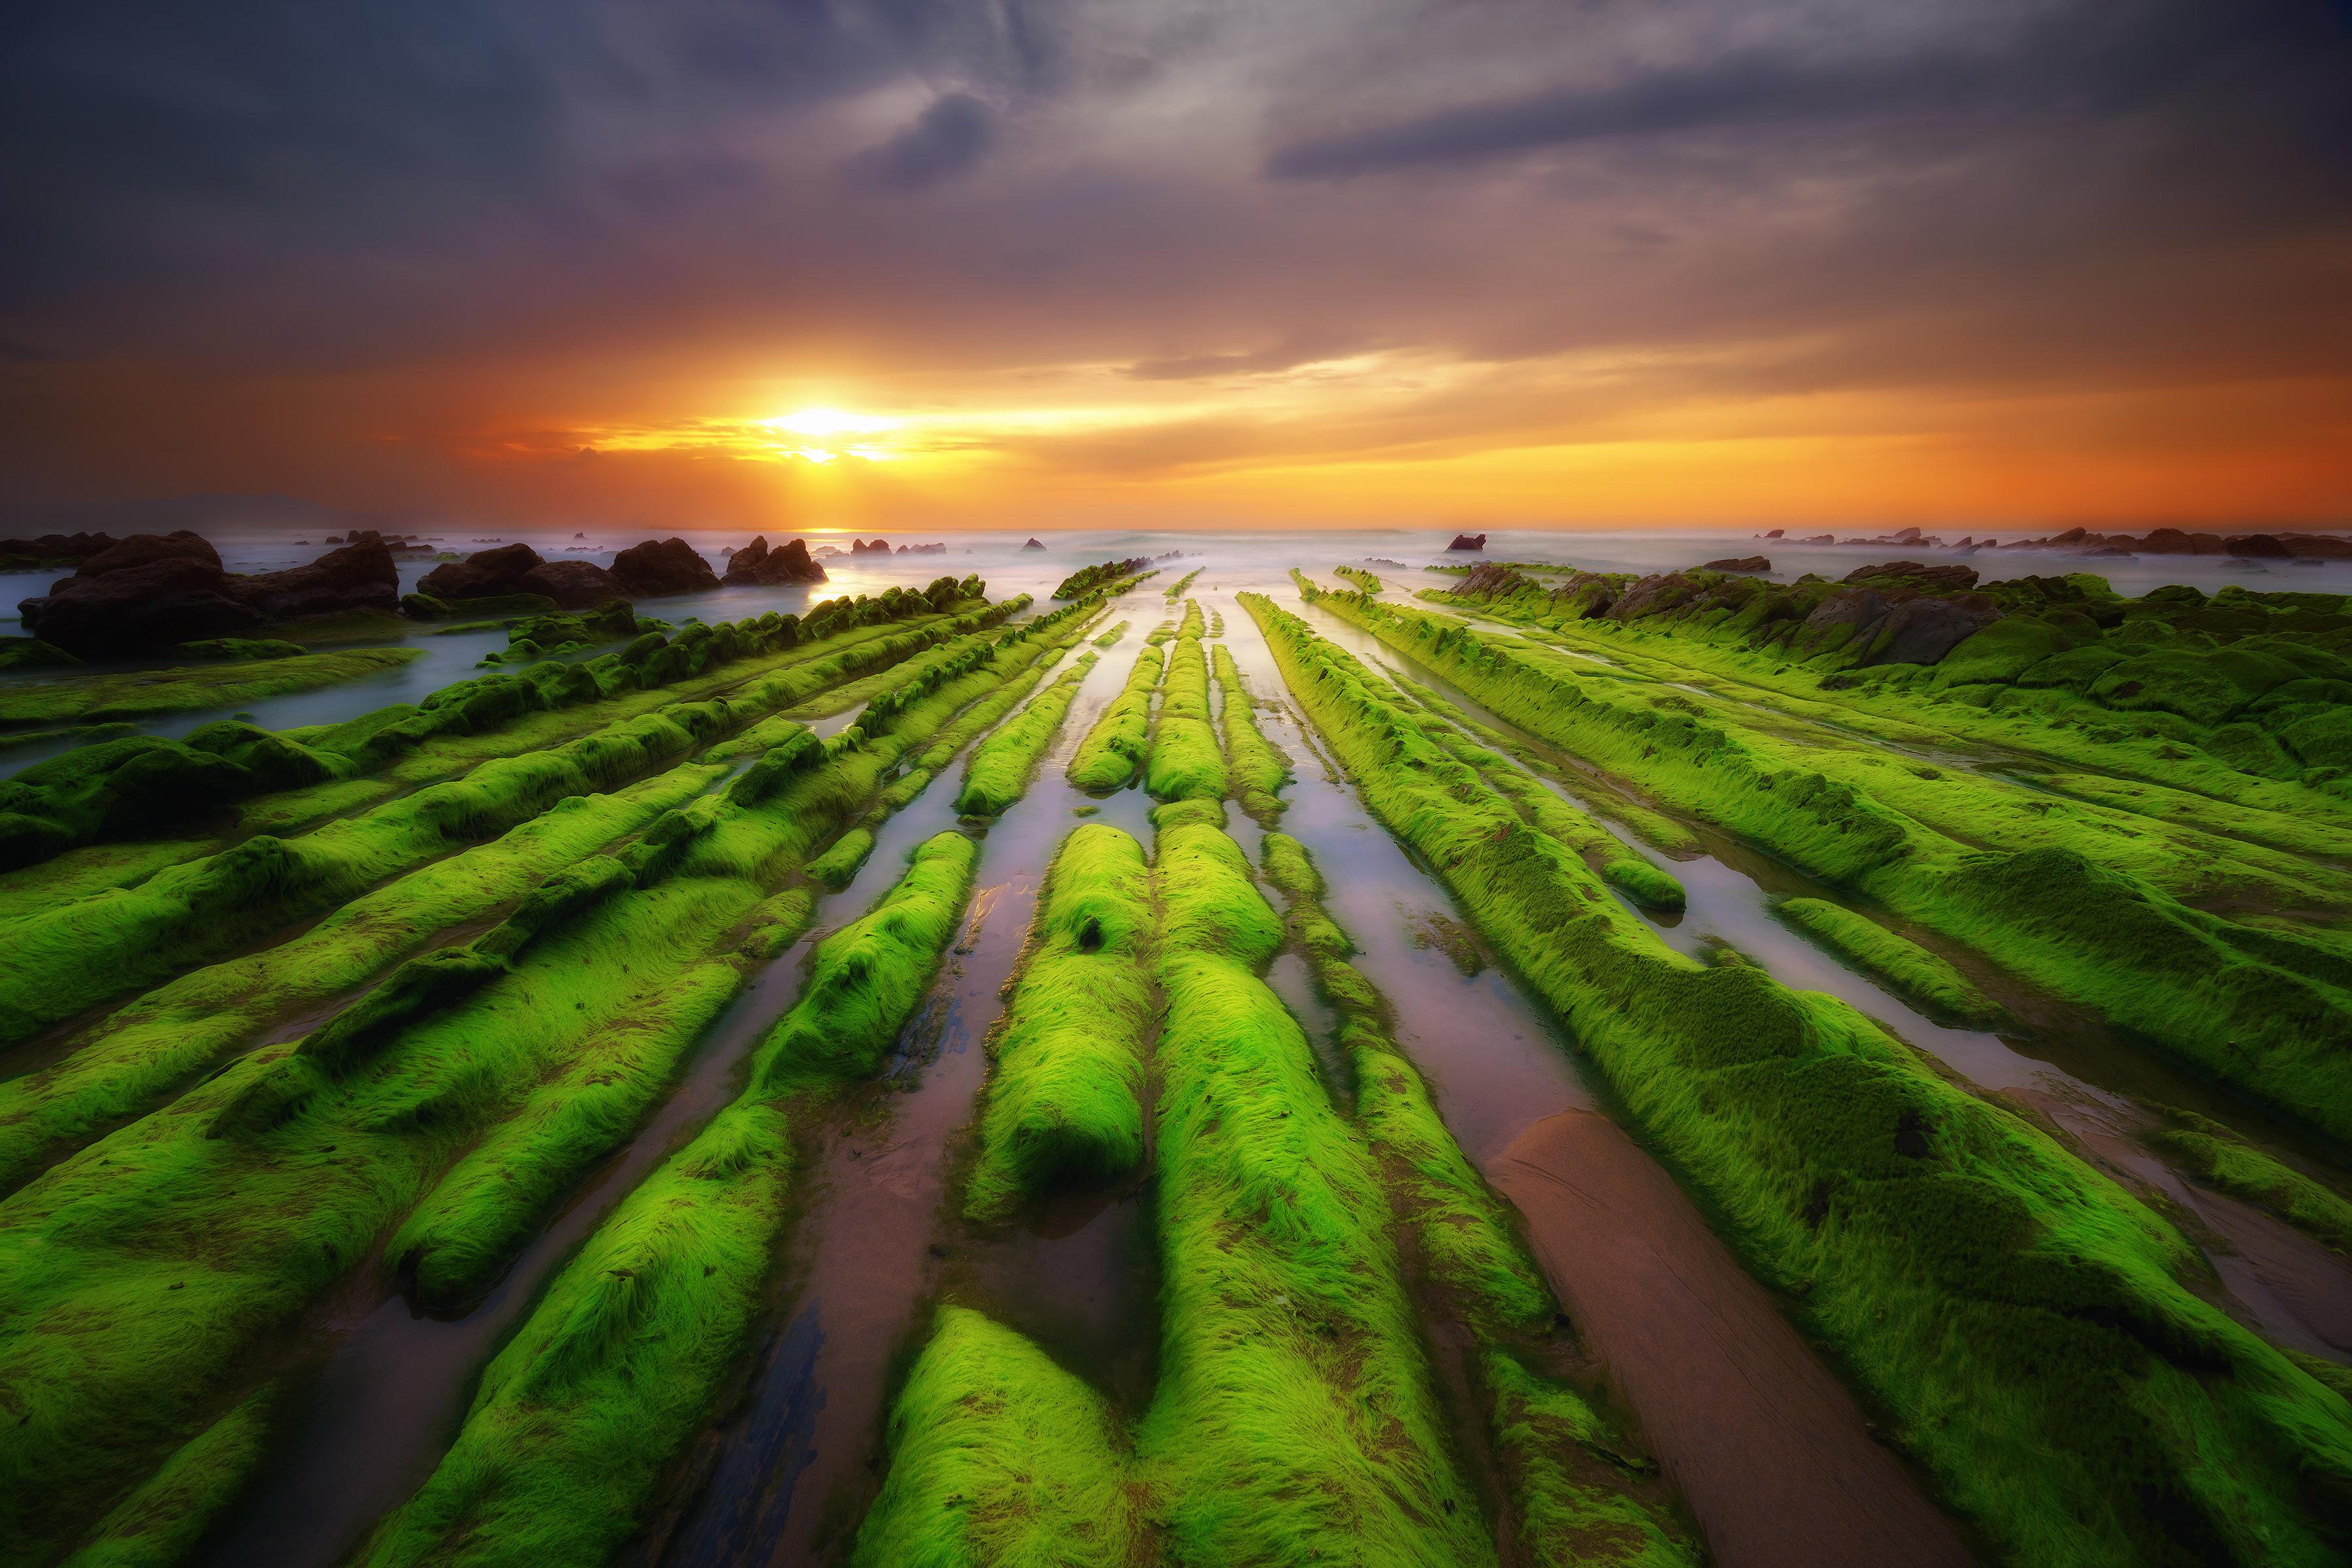 green seaweed on rocks in Barrika beach